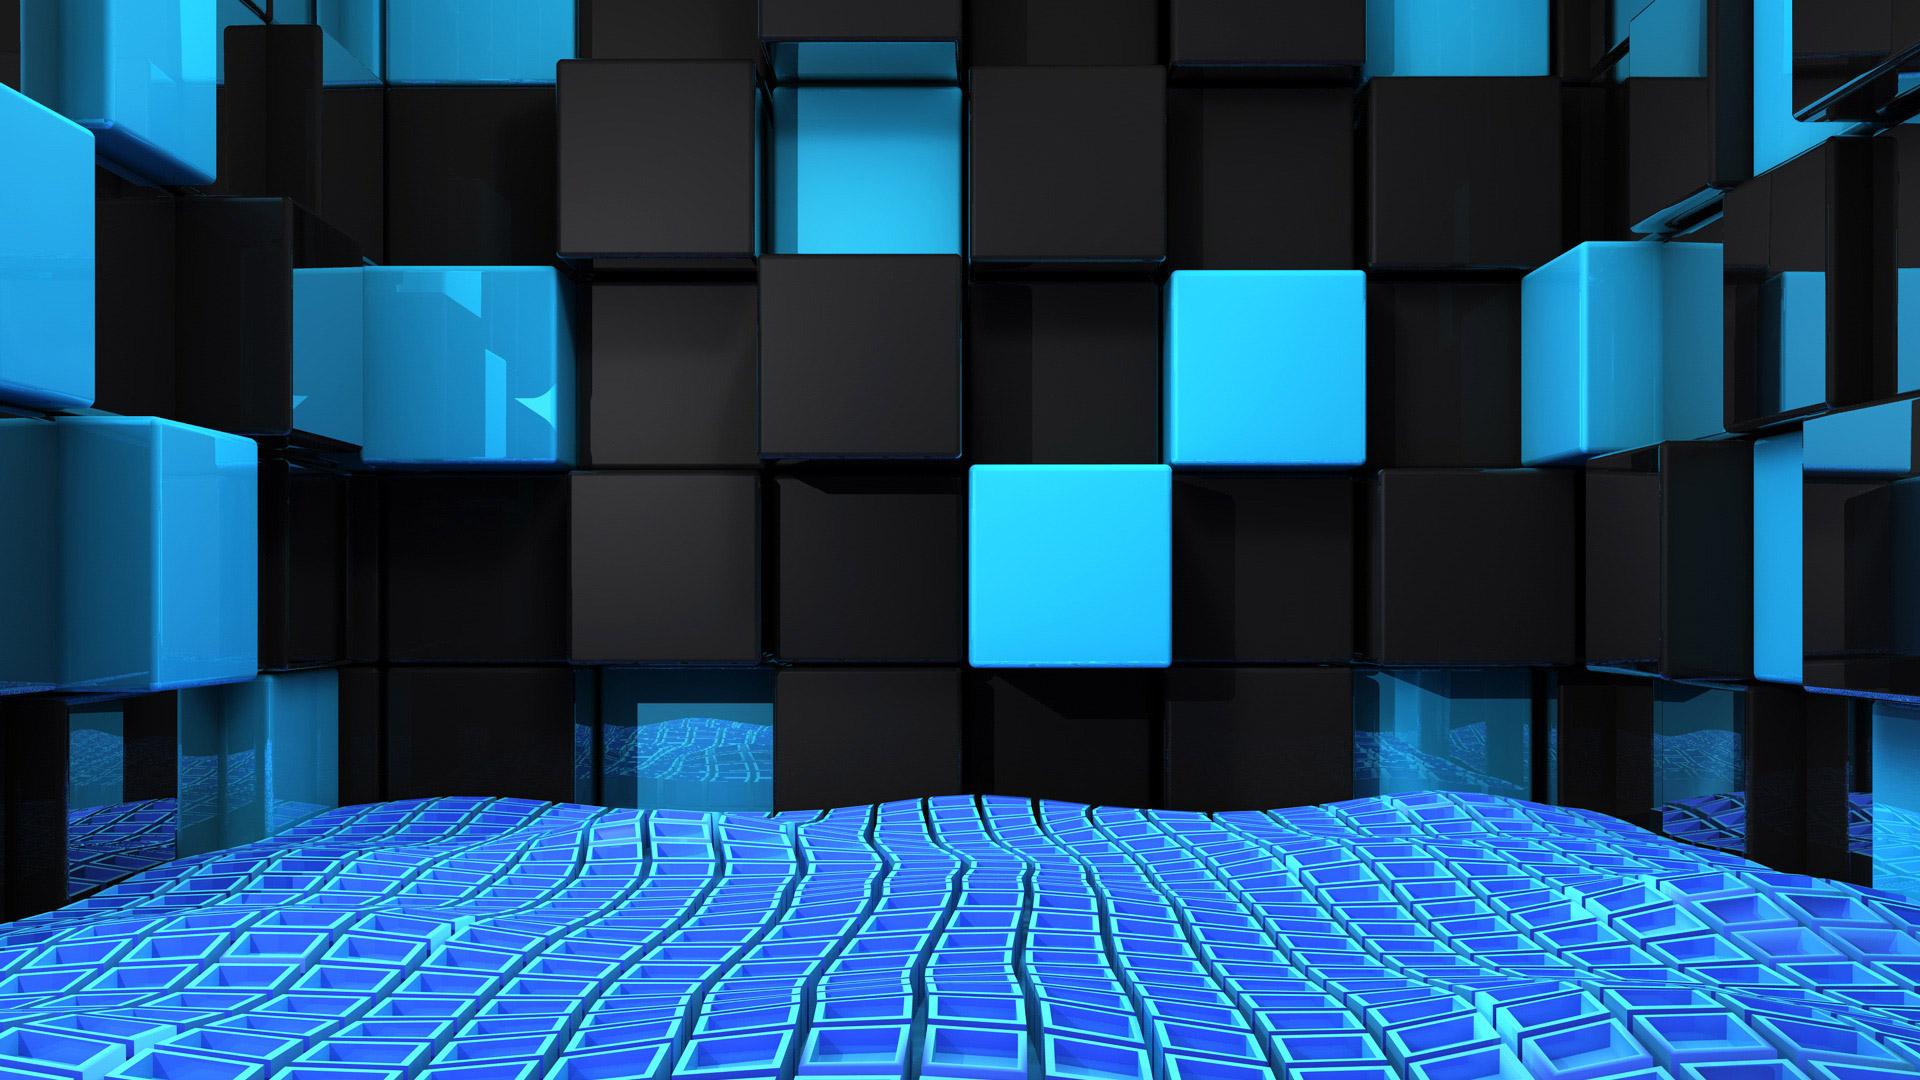 hd wallpaper 3d cubes abstract backgrounds wallpapers55com 1920x1080